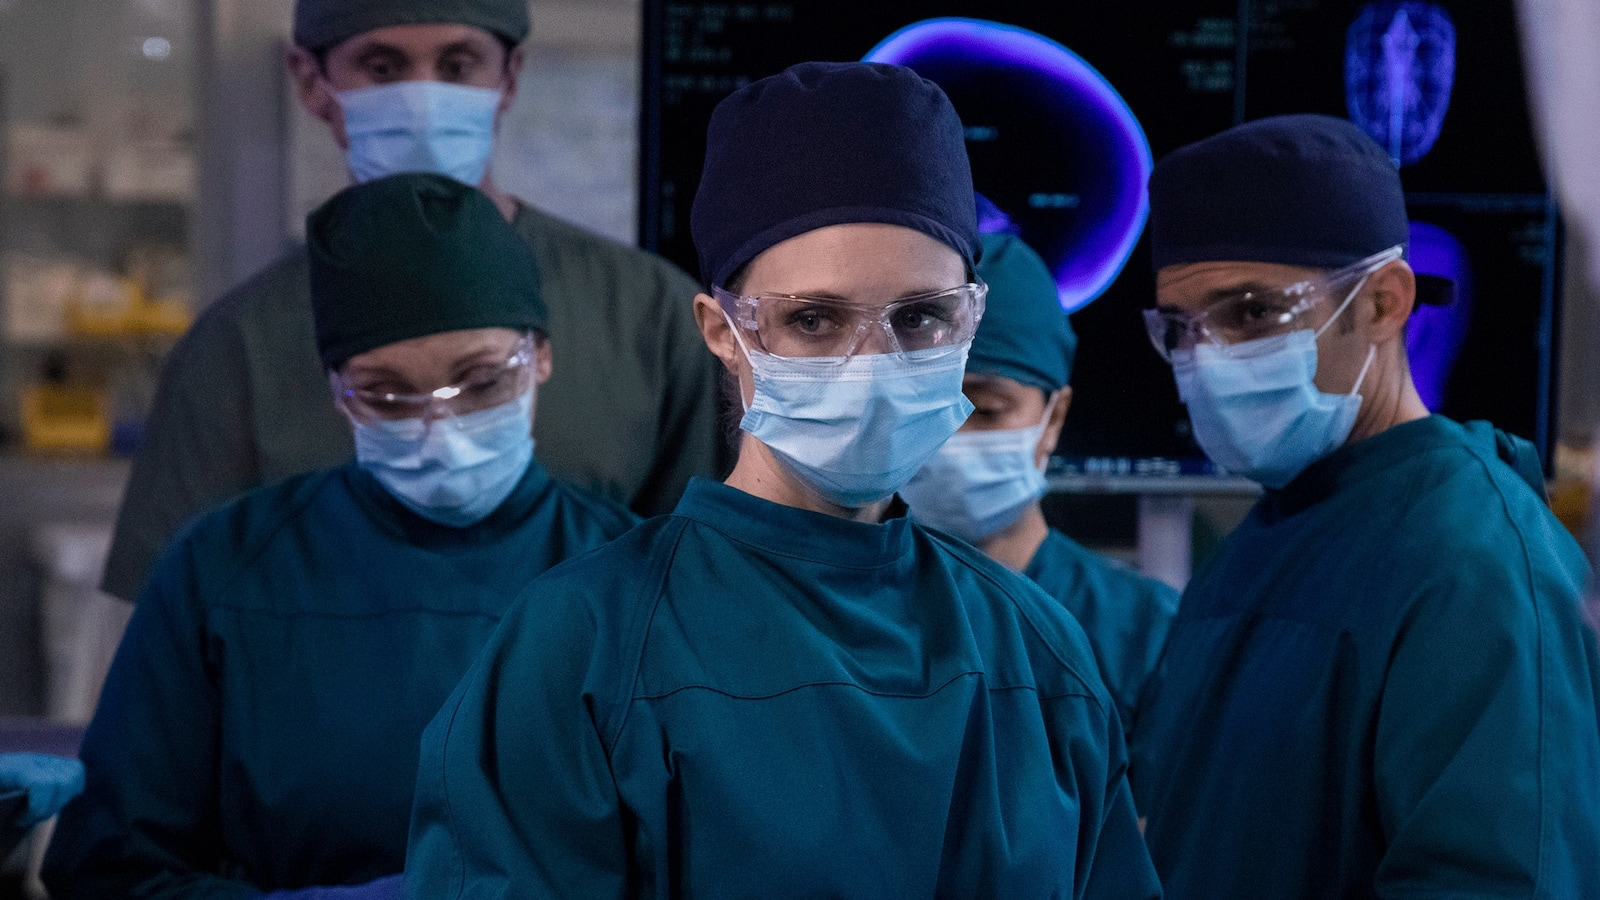 the-good-doctor/sasong-2/avsnitt-14